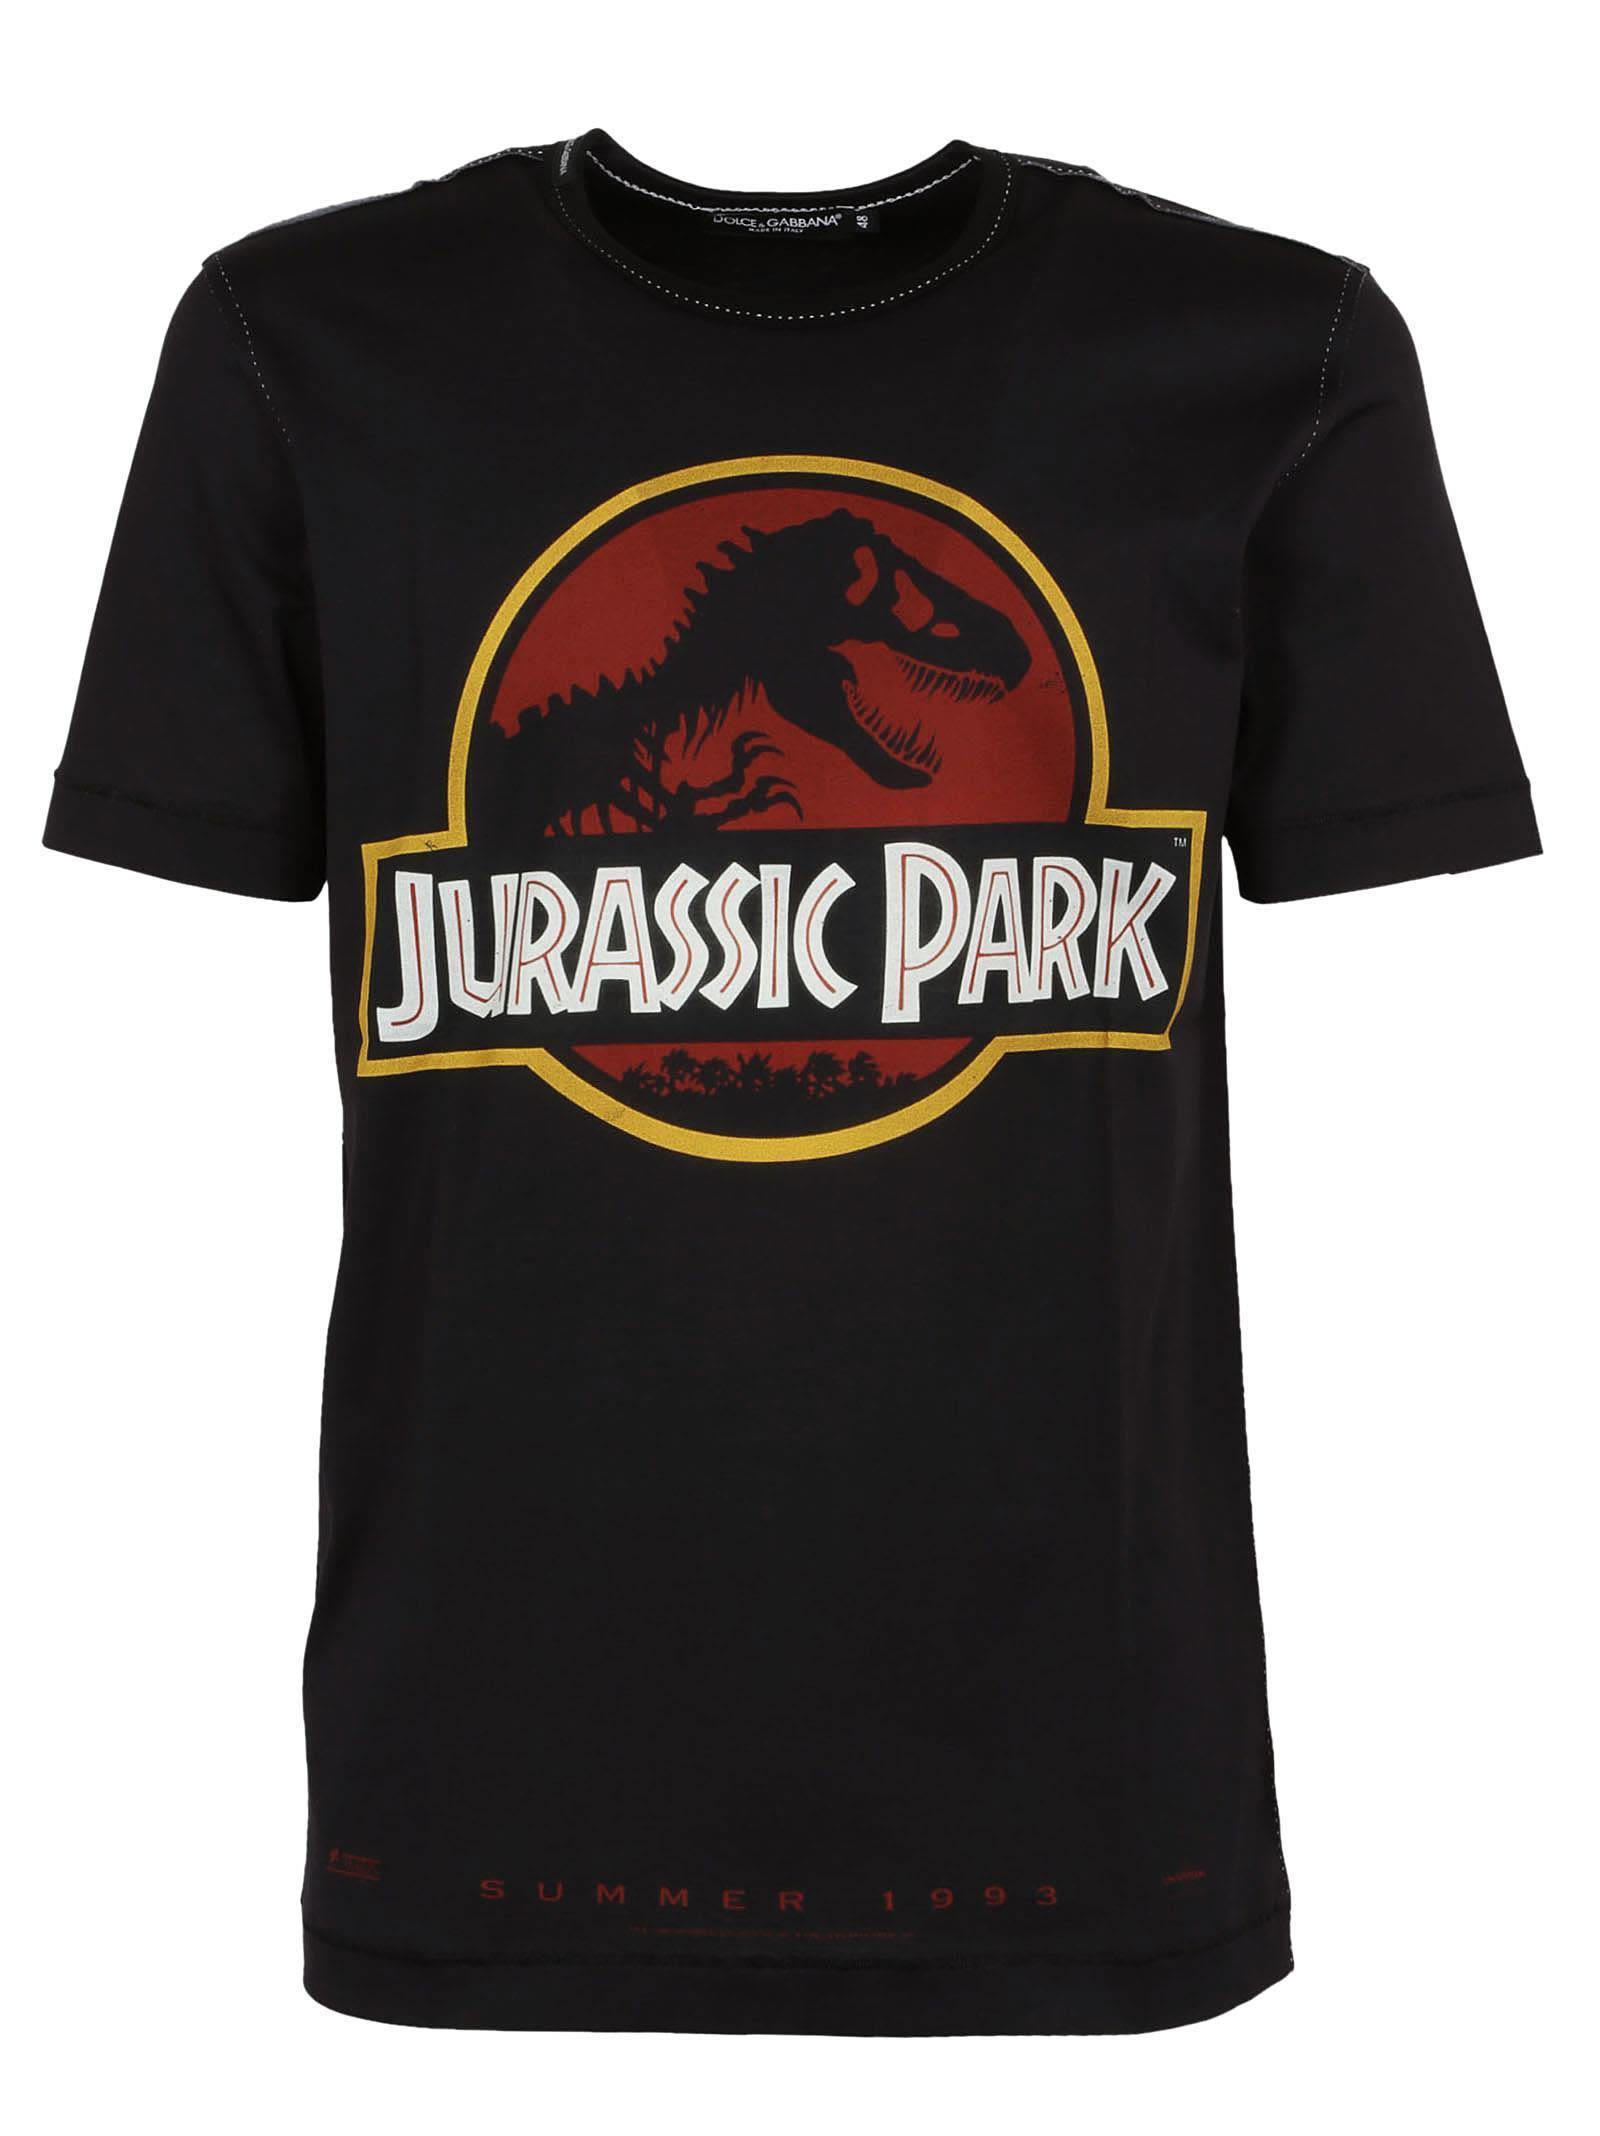 Dolce & Gabbana Jurassic Park T-shirt